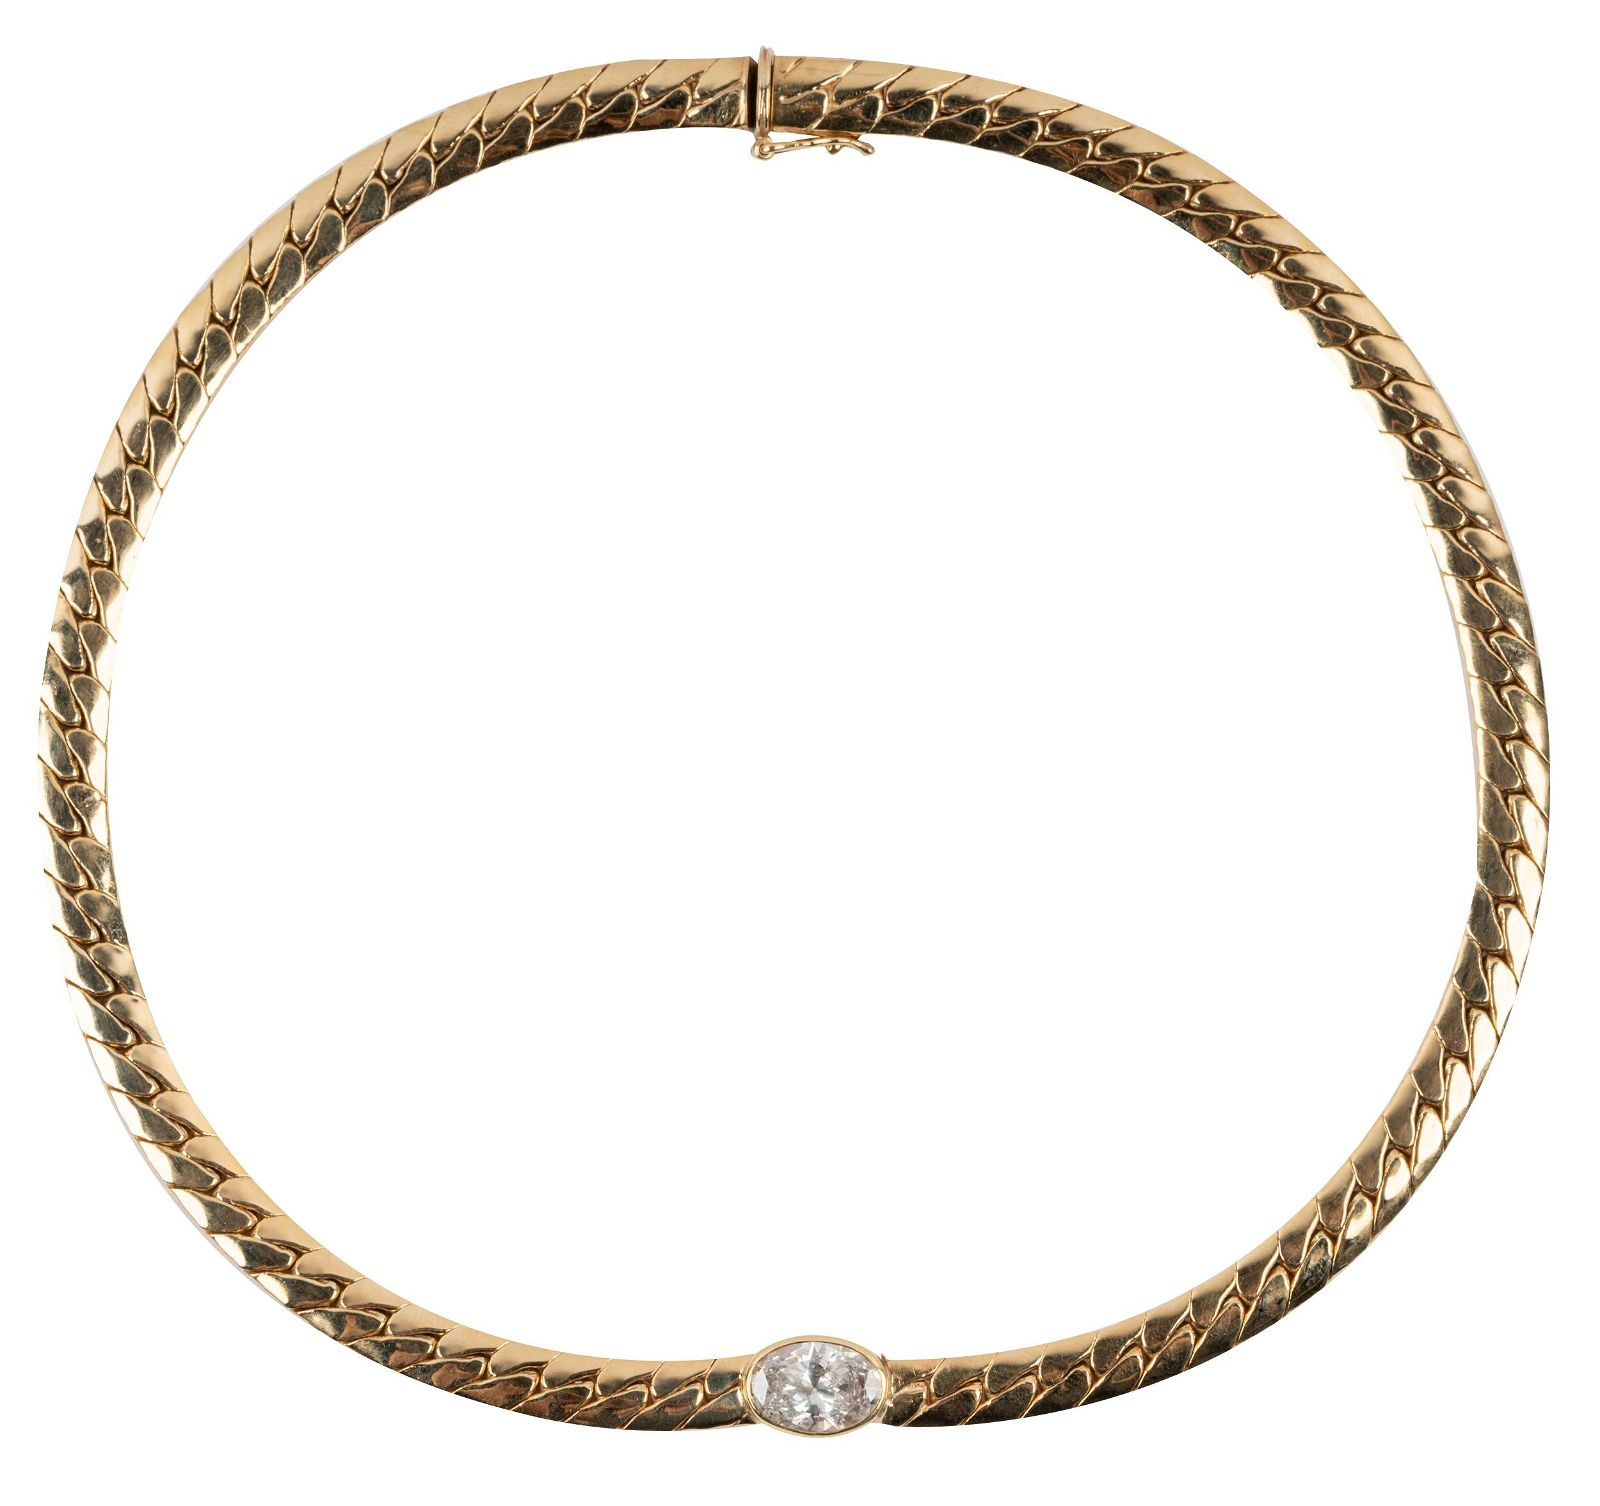 14 KARAT YELLOW GOLD & DIAMOND NECKLACE